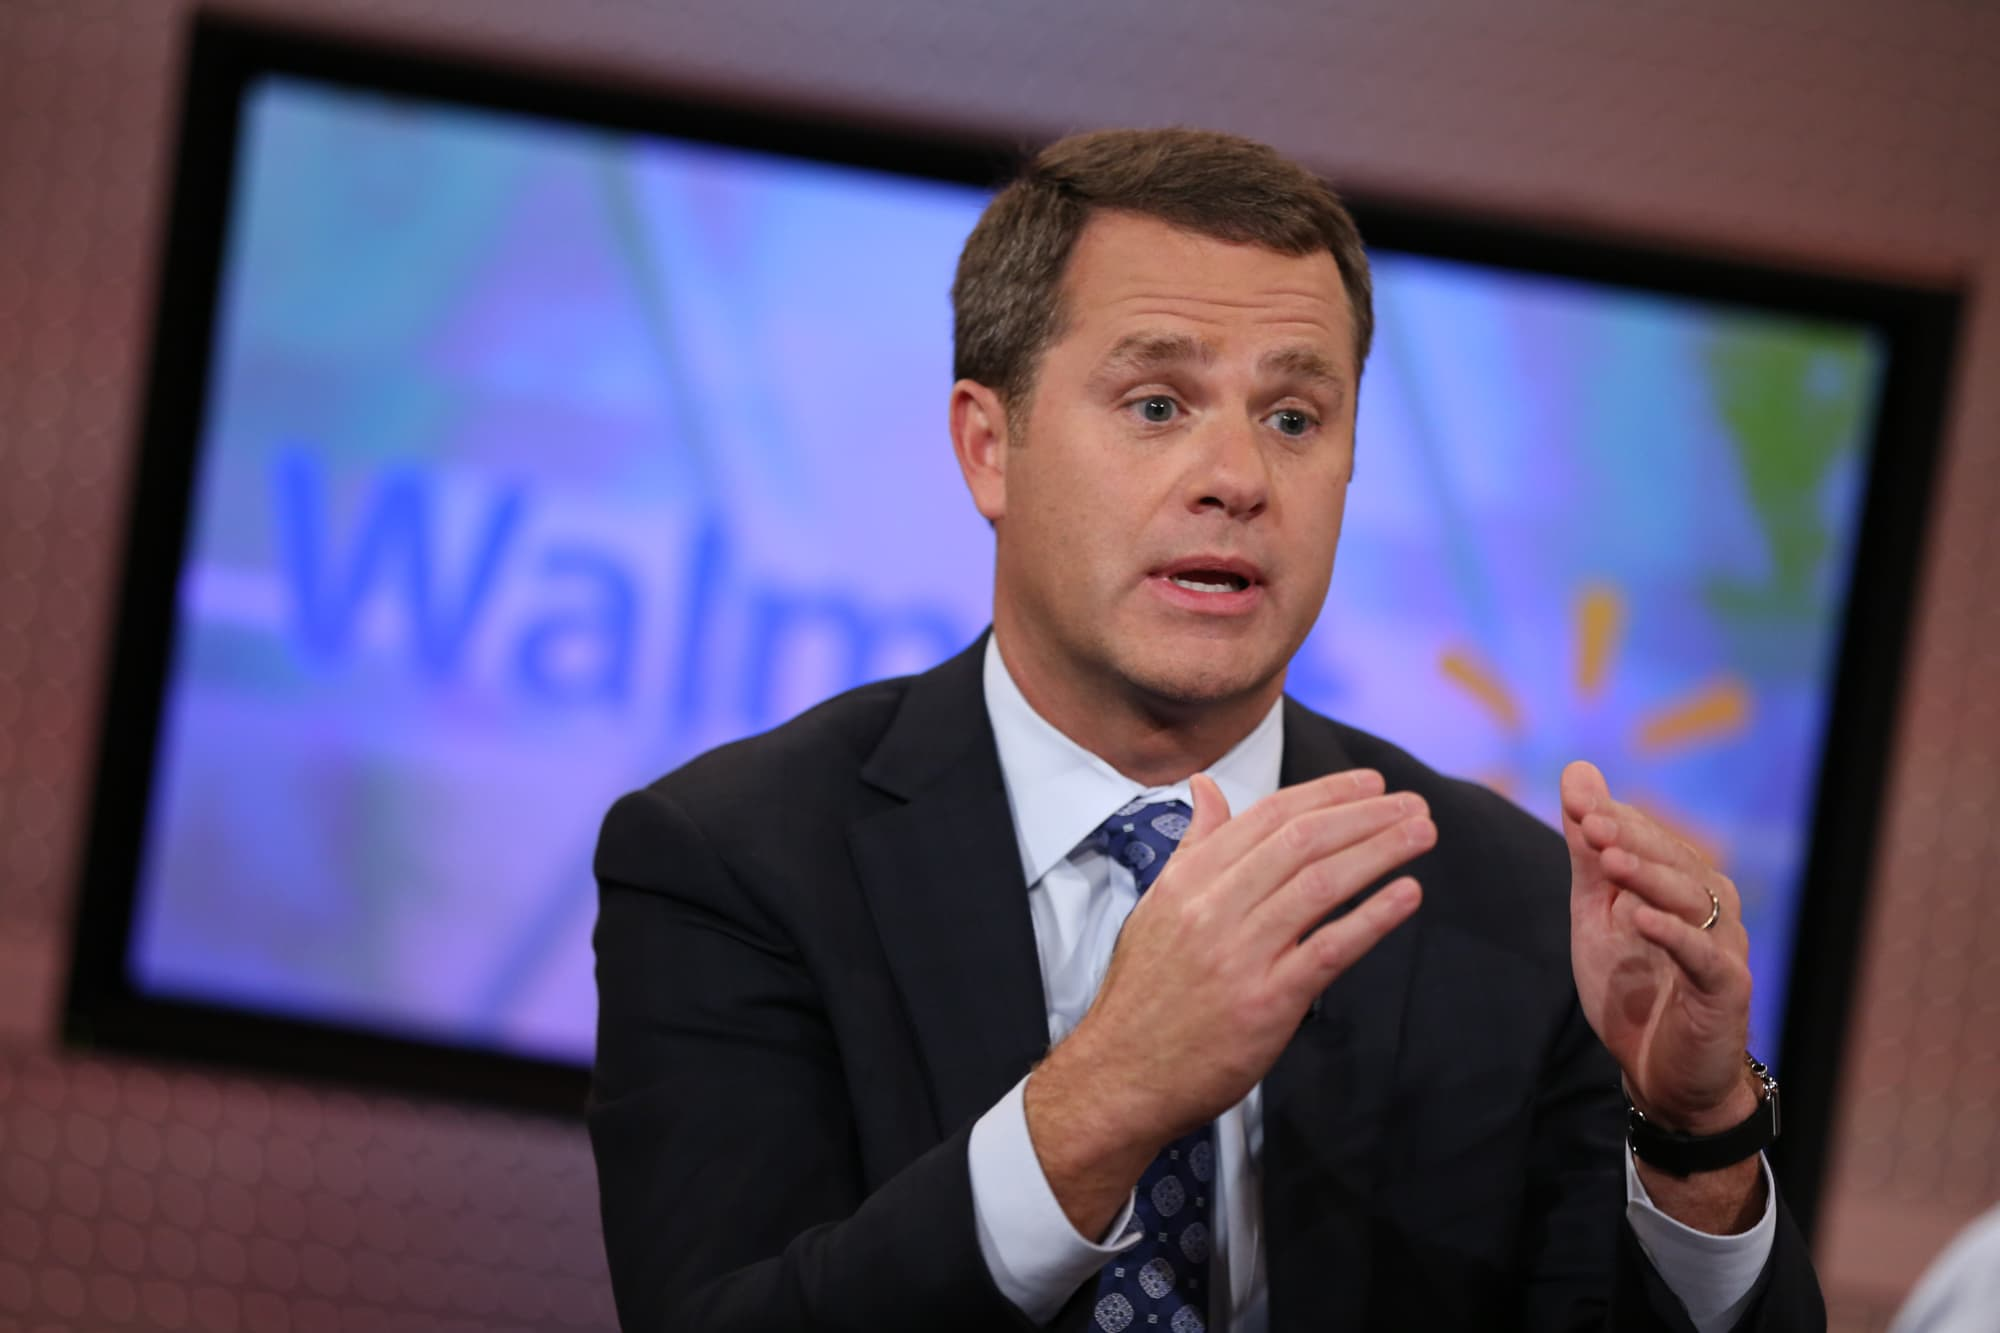 Walmart CEO Doug McMillon: 'We need even more progress on Walmart.com'